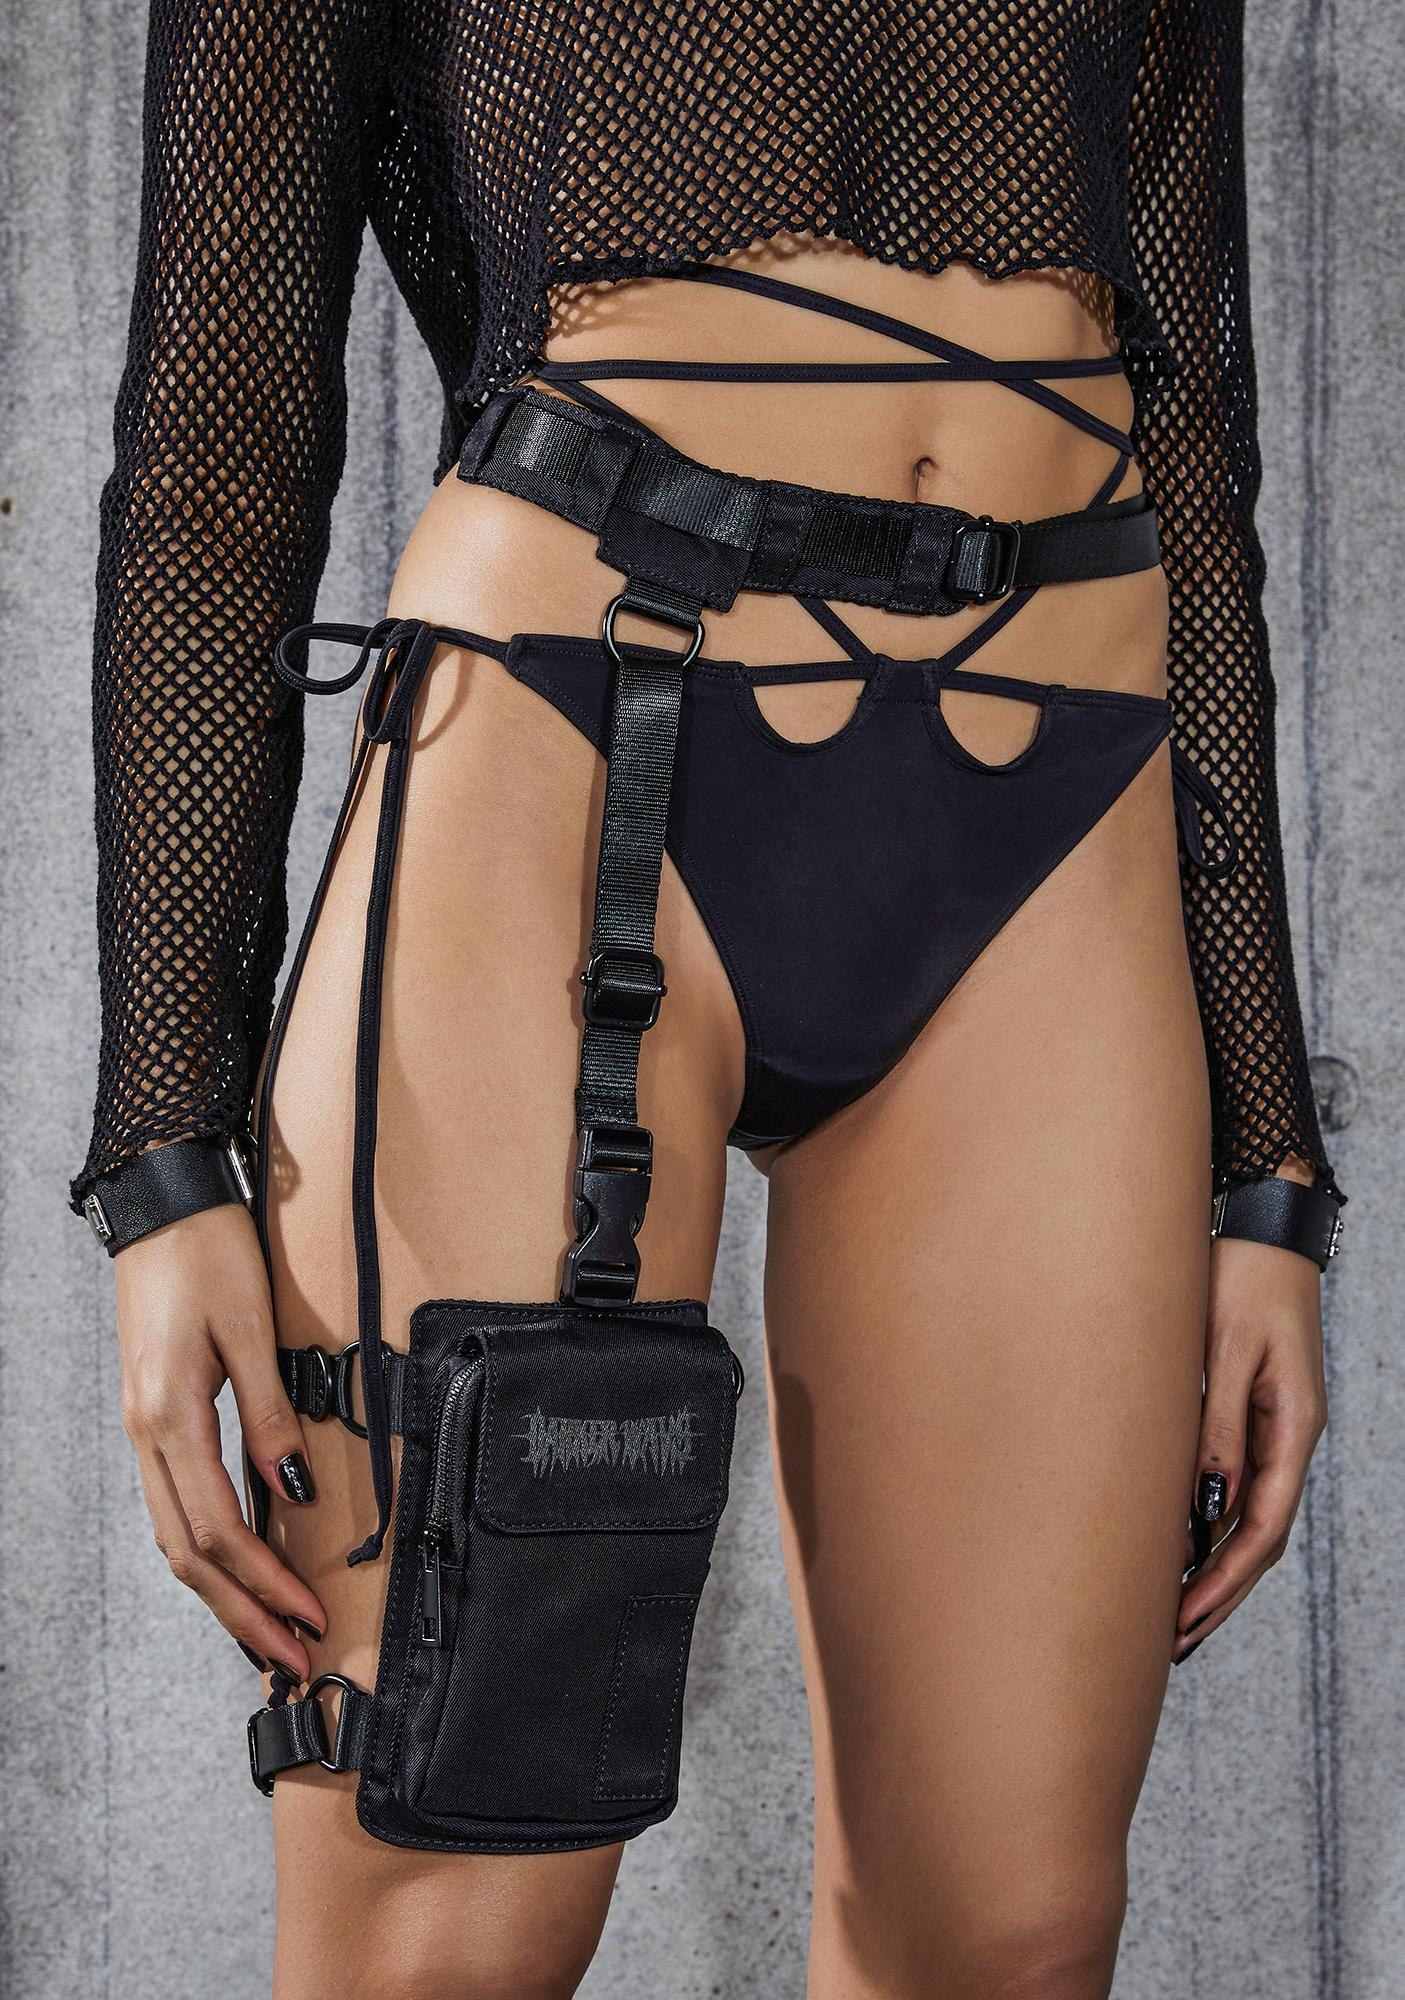 DARKER WAVS Snare Leg Garter Utility Belt Bag